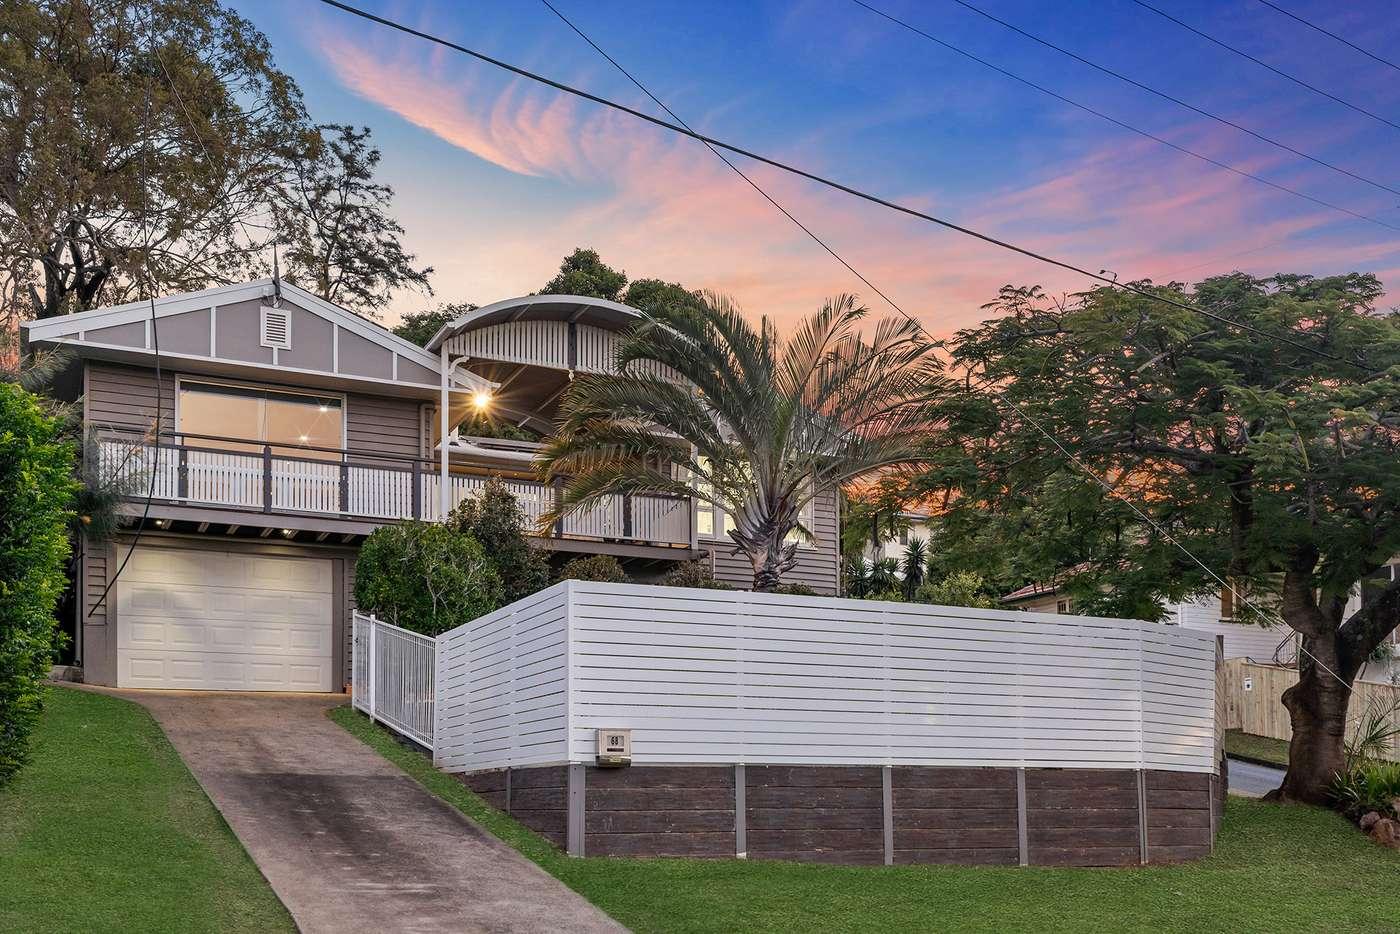 Main view of Homely house listing, 68 Hoff Street, Mount Gravatt East QLD 4122